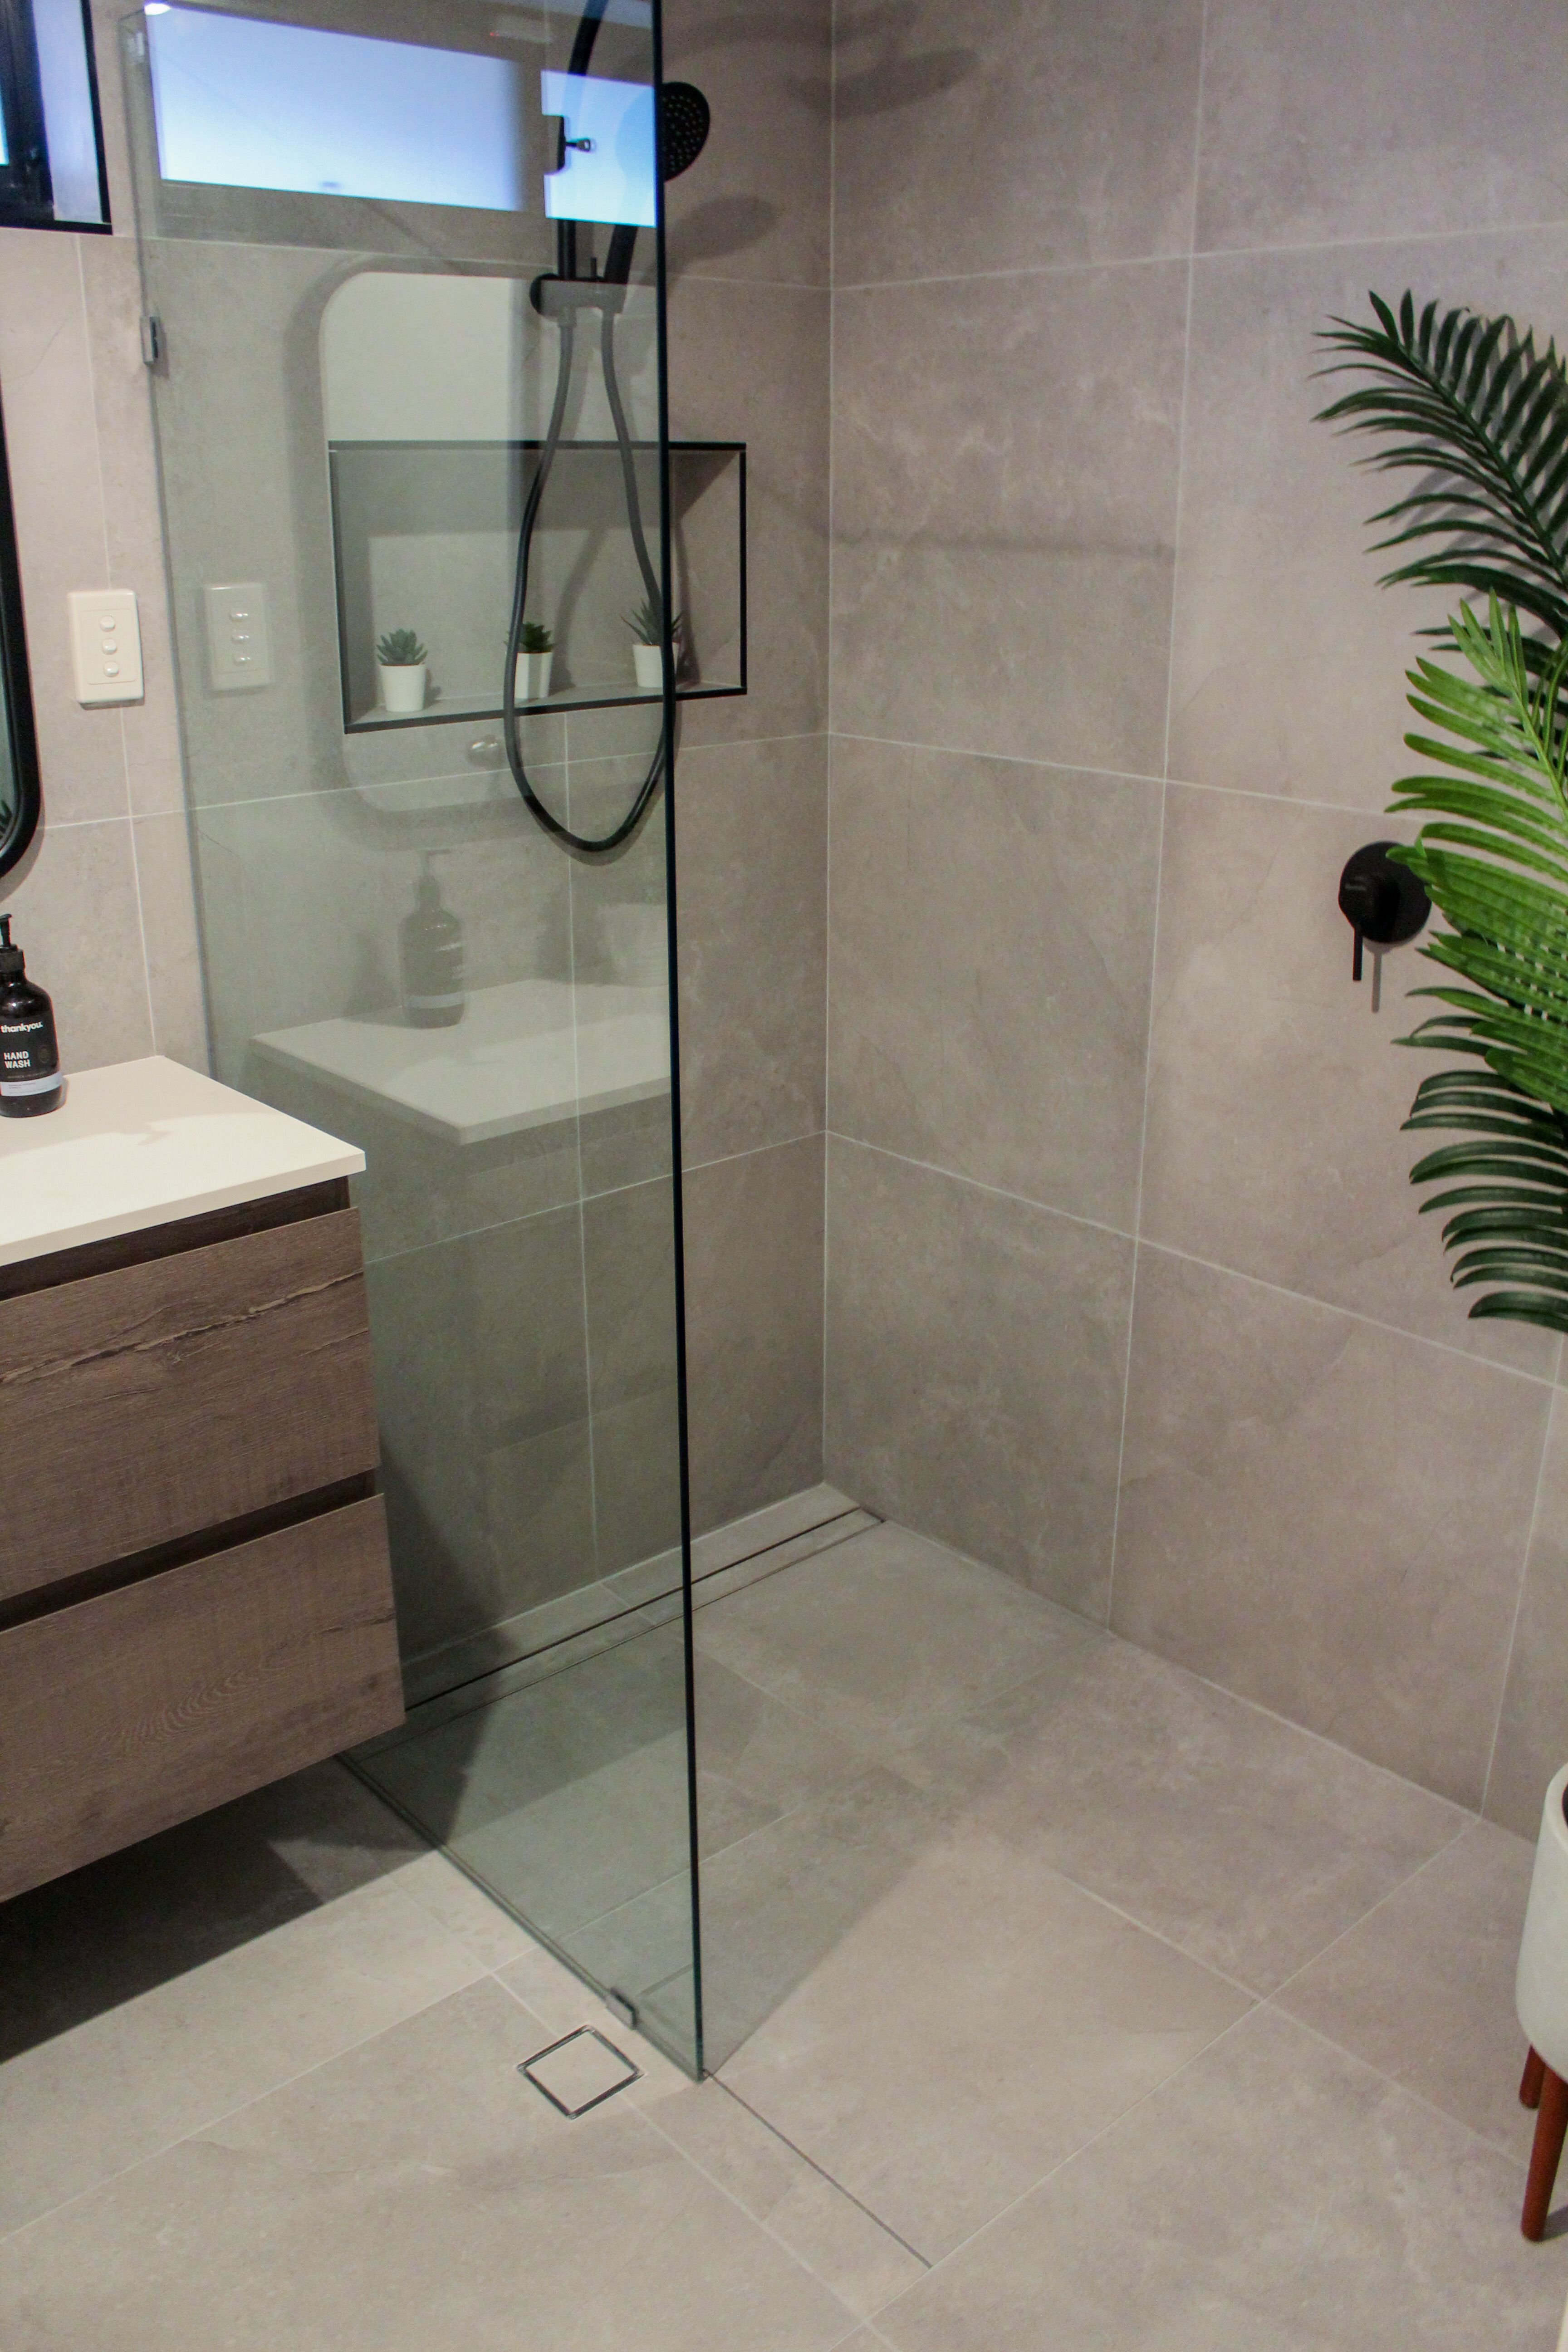 Panel Shower Childrens Bathroom Shower Black Shower Bathroom